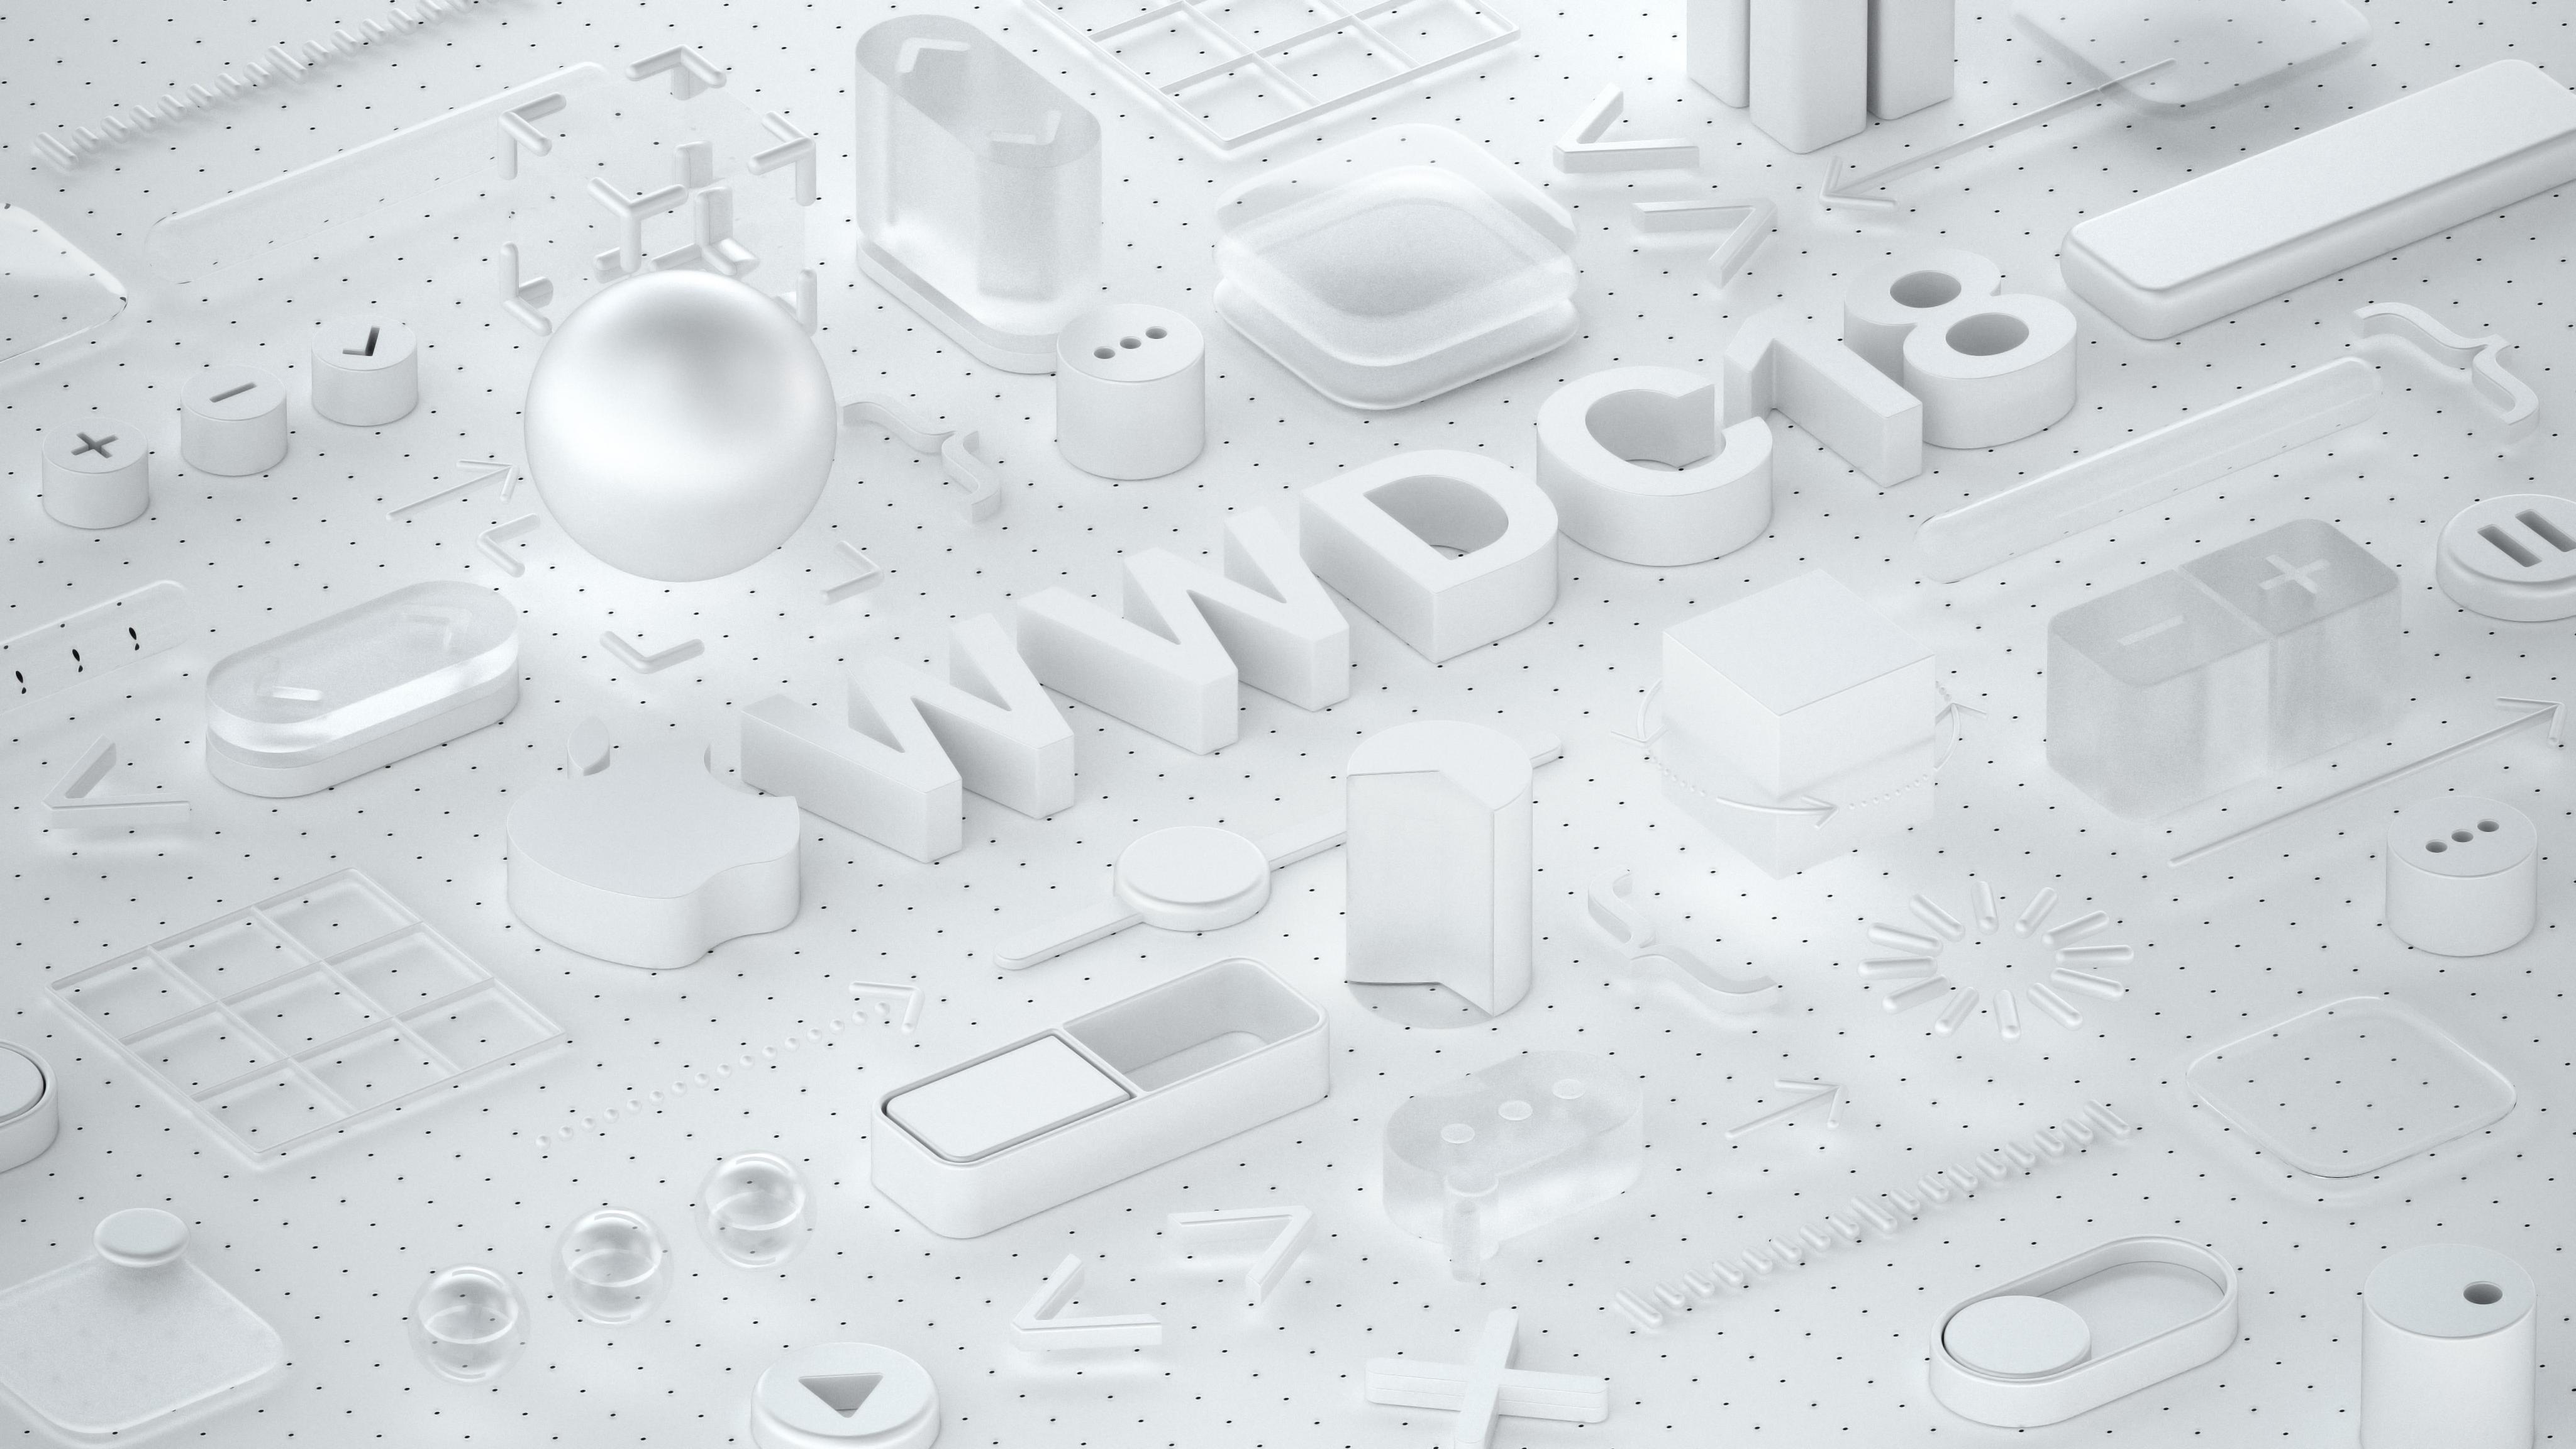 Confira Mais Wallpapers Da WWDC 2018, Agora Para Macs